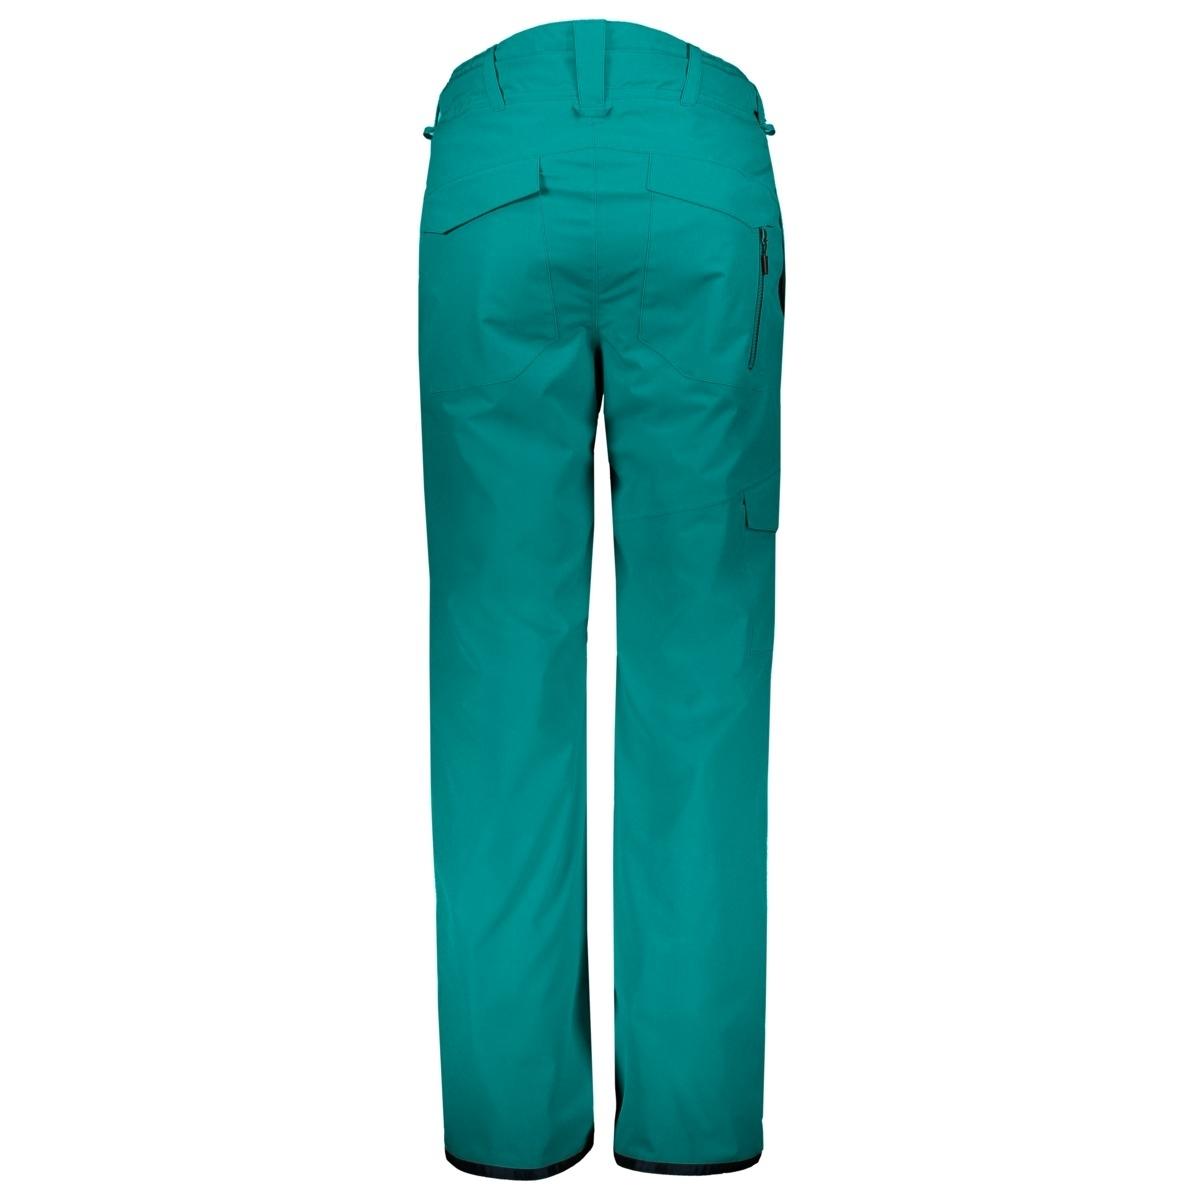 Scott Ultimate Dryo 20 Pant Lake Blue 2018